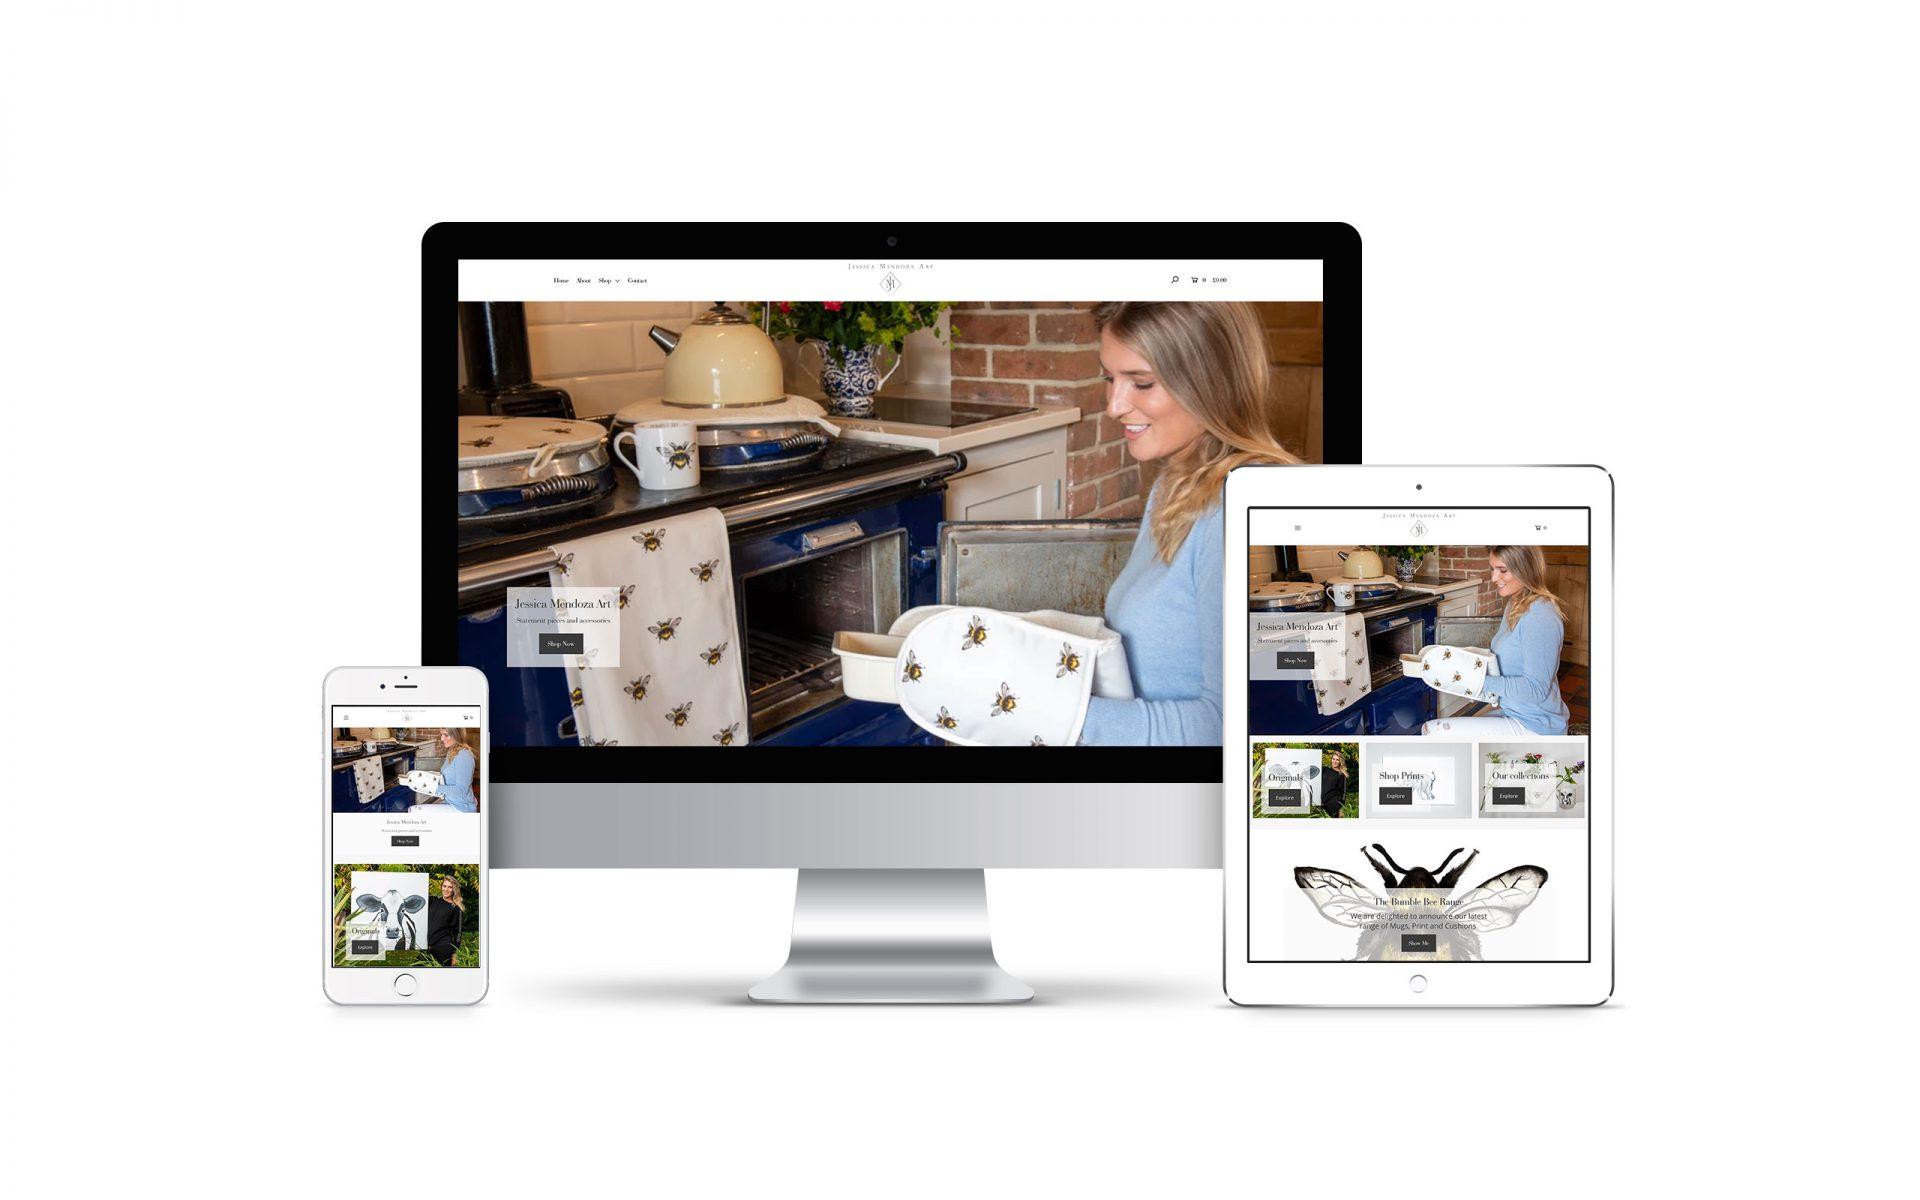 eCommerce website design for Jess Mendoza